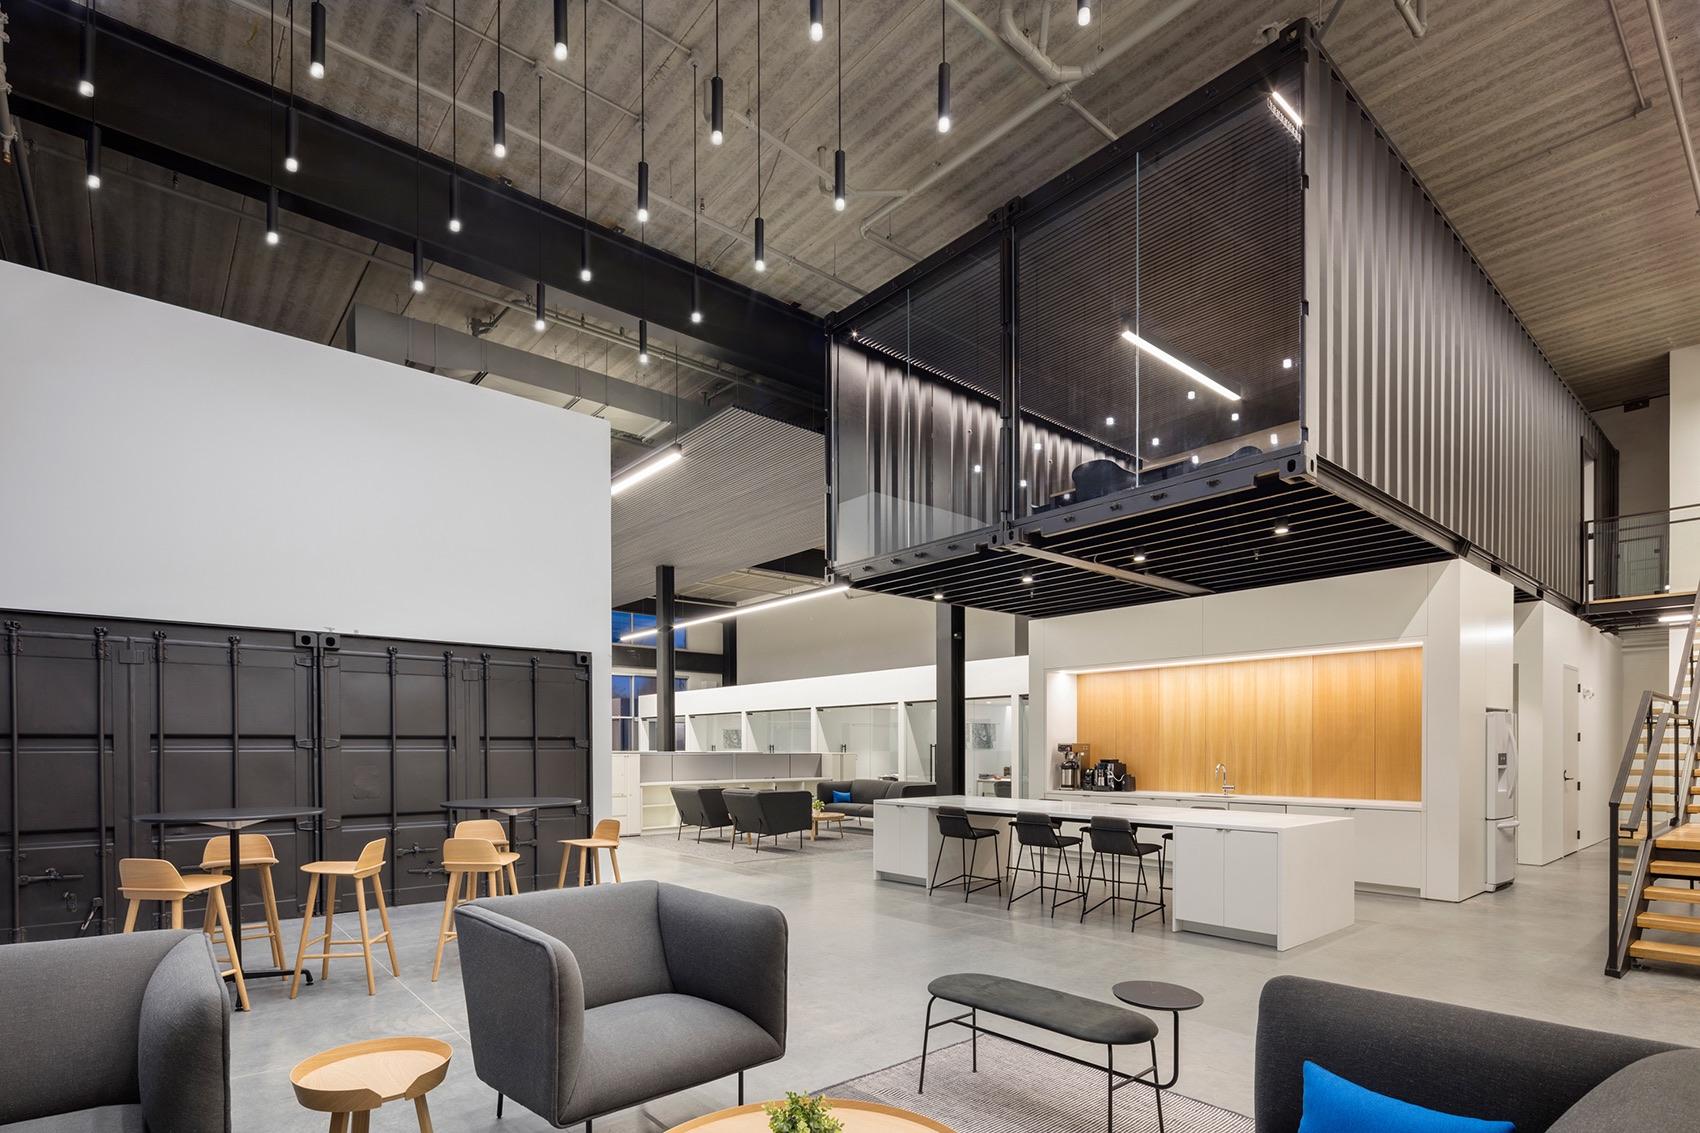 Inside The New Offices of Port KC in Kansas City